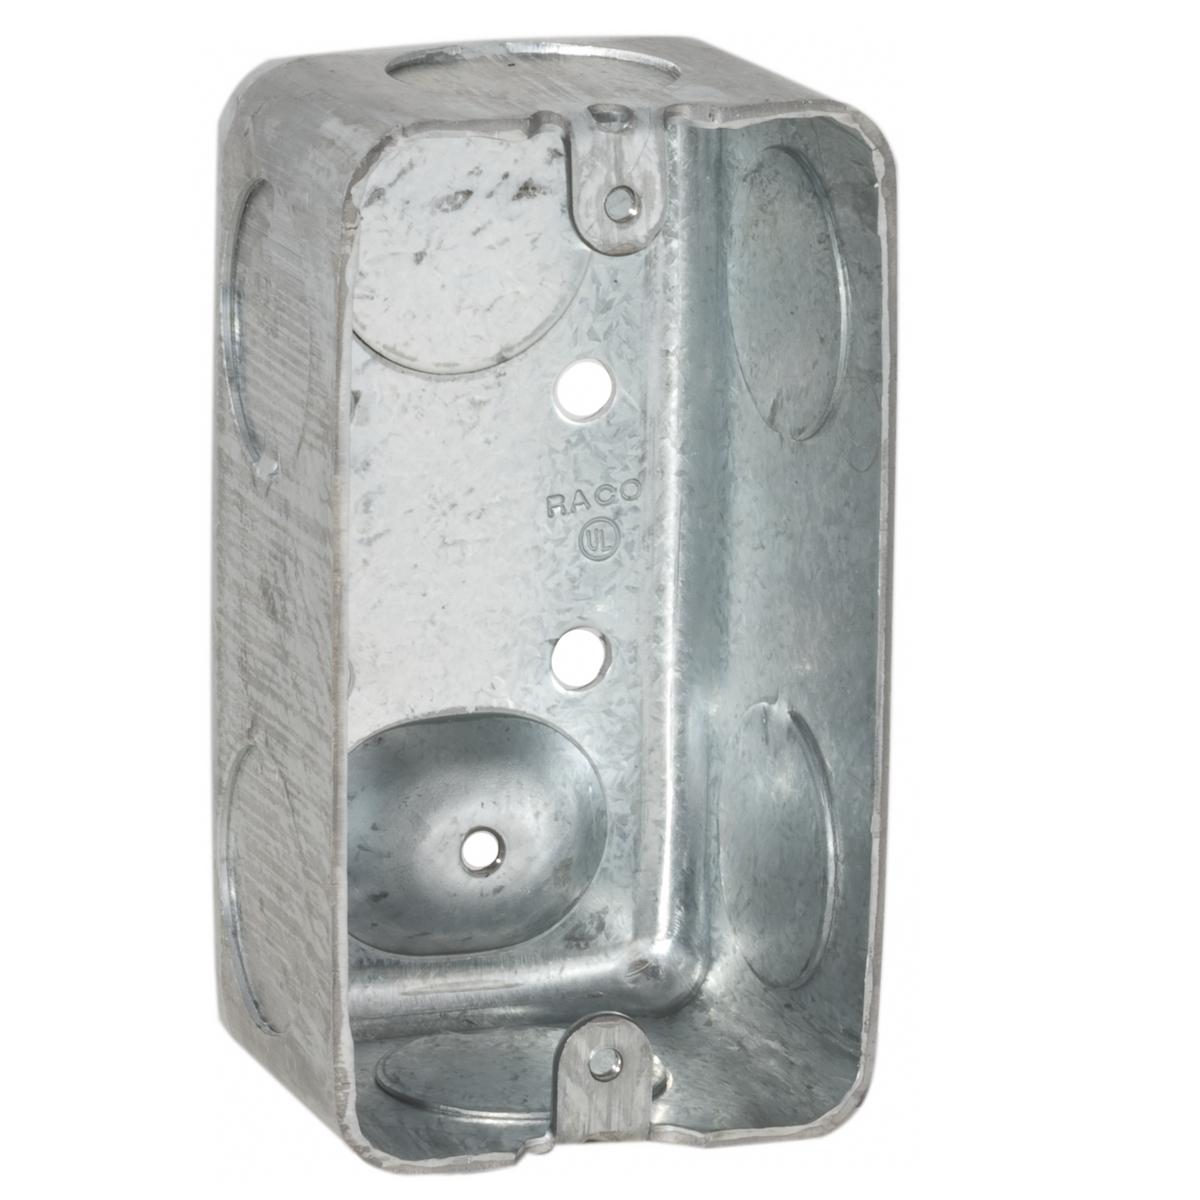 Hubbell-Raco 663 Handy Box